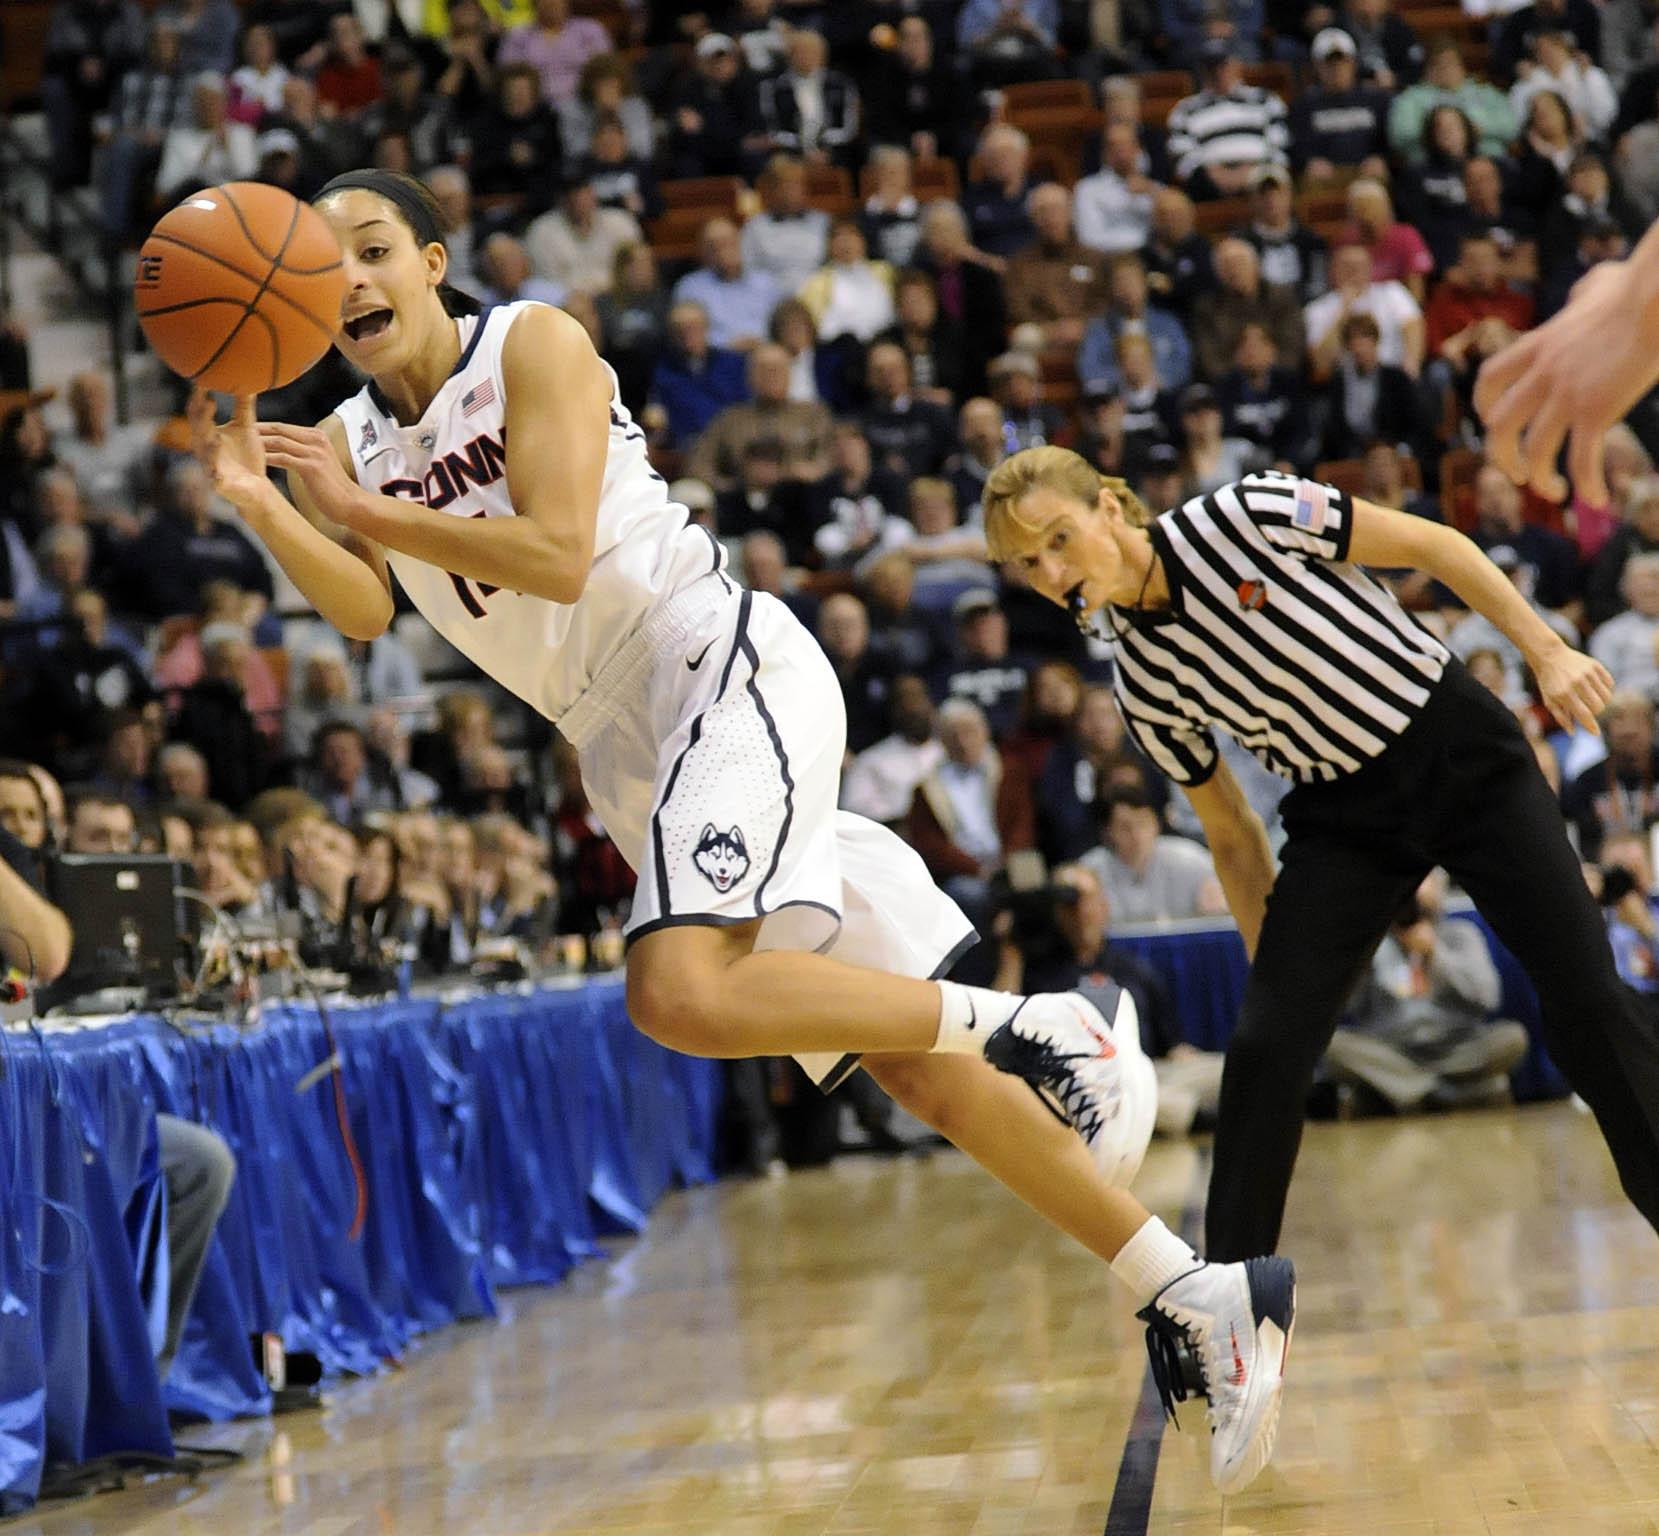 Pictures: UConn Women Vs. Louisville, AAC Final - Chicago Tribune